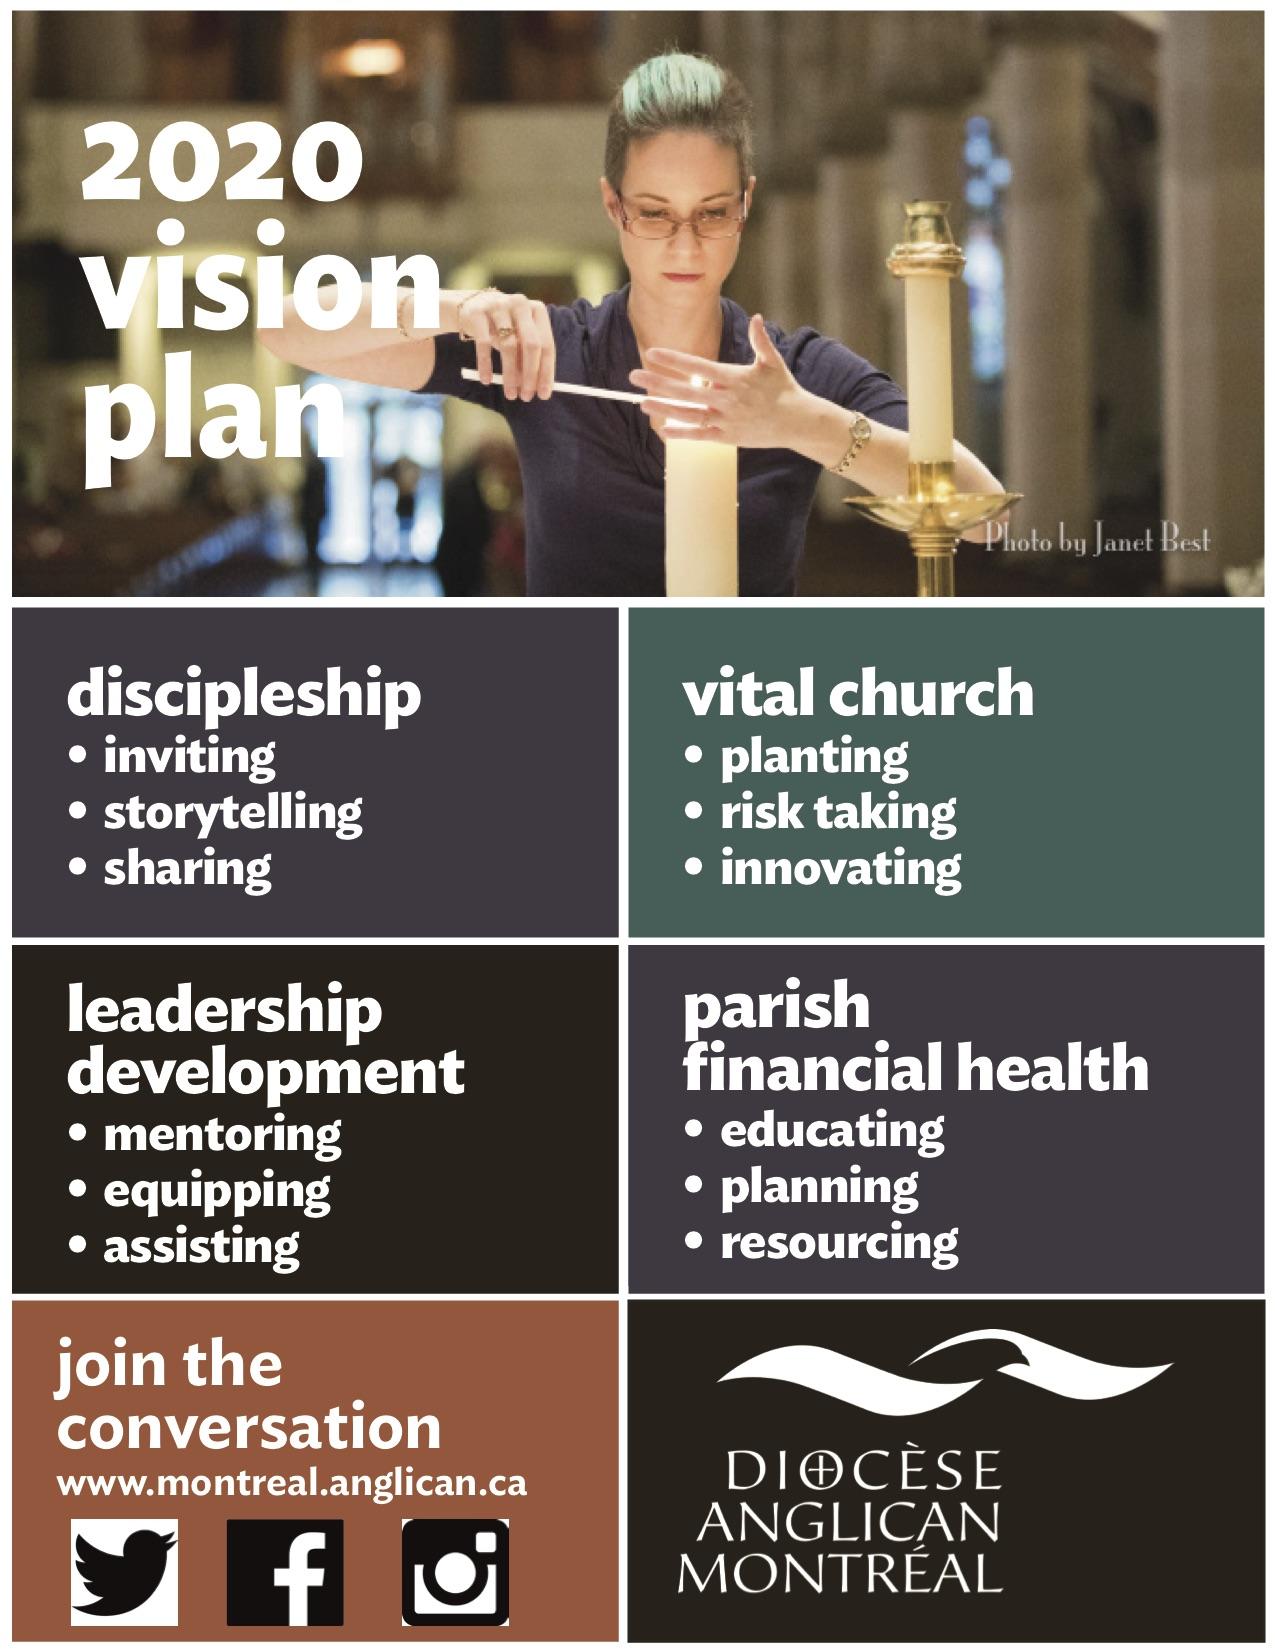 2020 vision copy.jpg